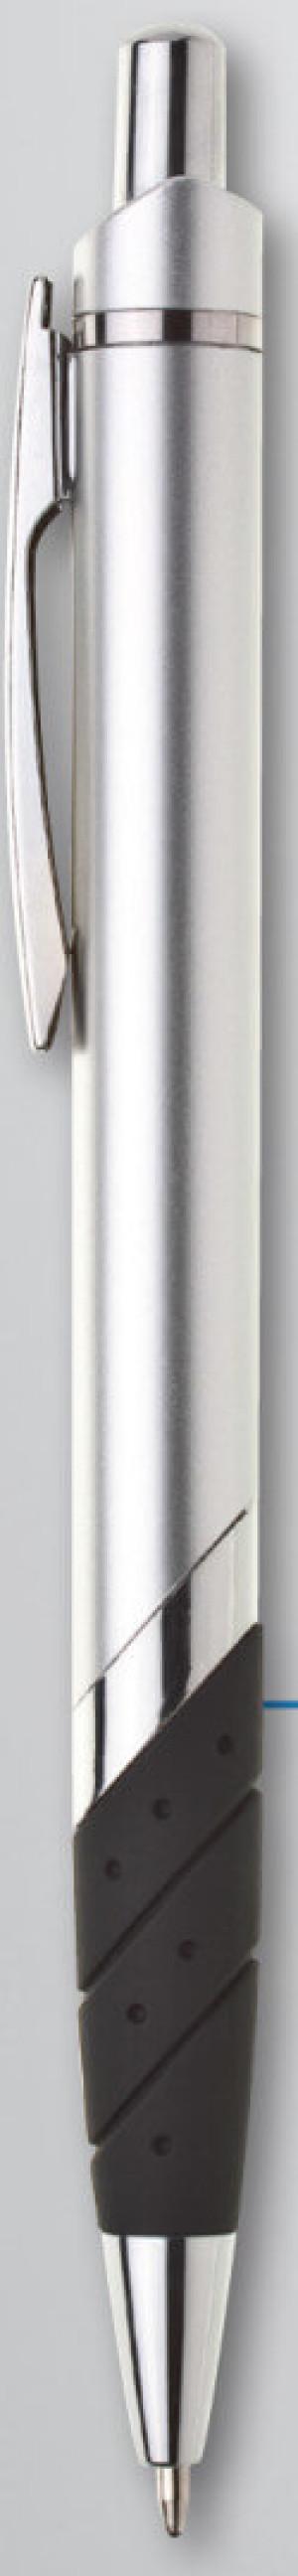 Kugelschreiber HZ 9256